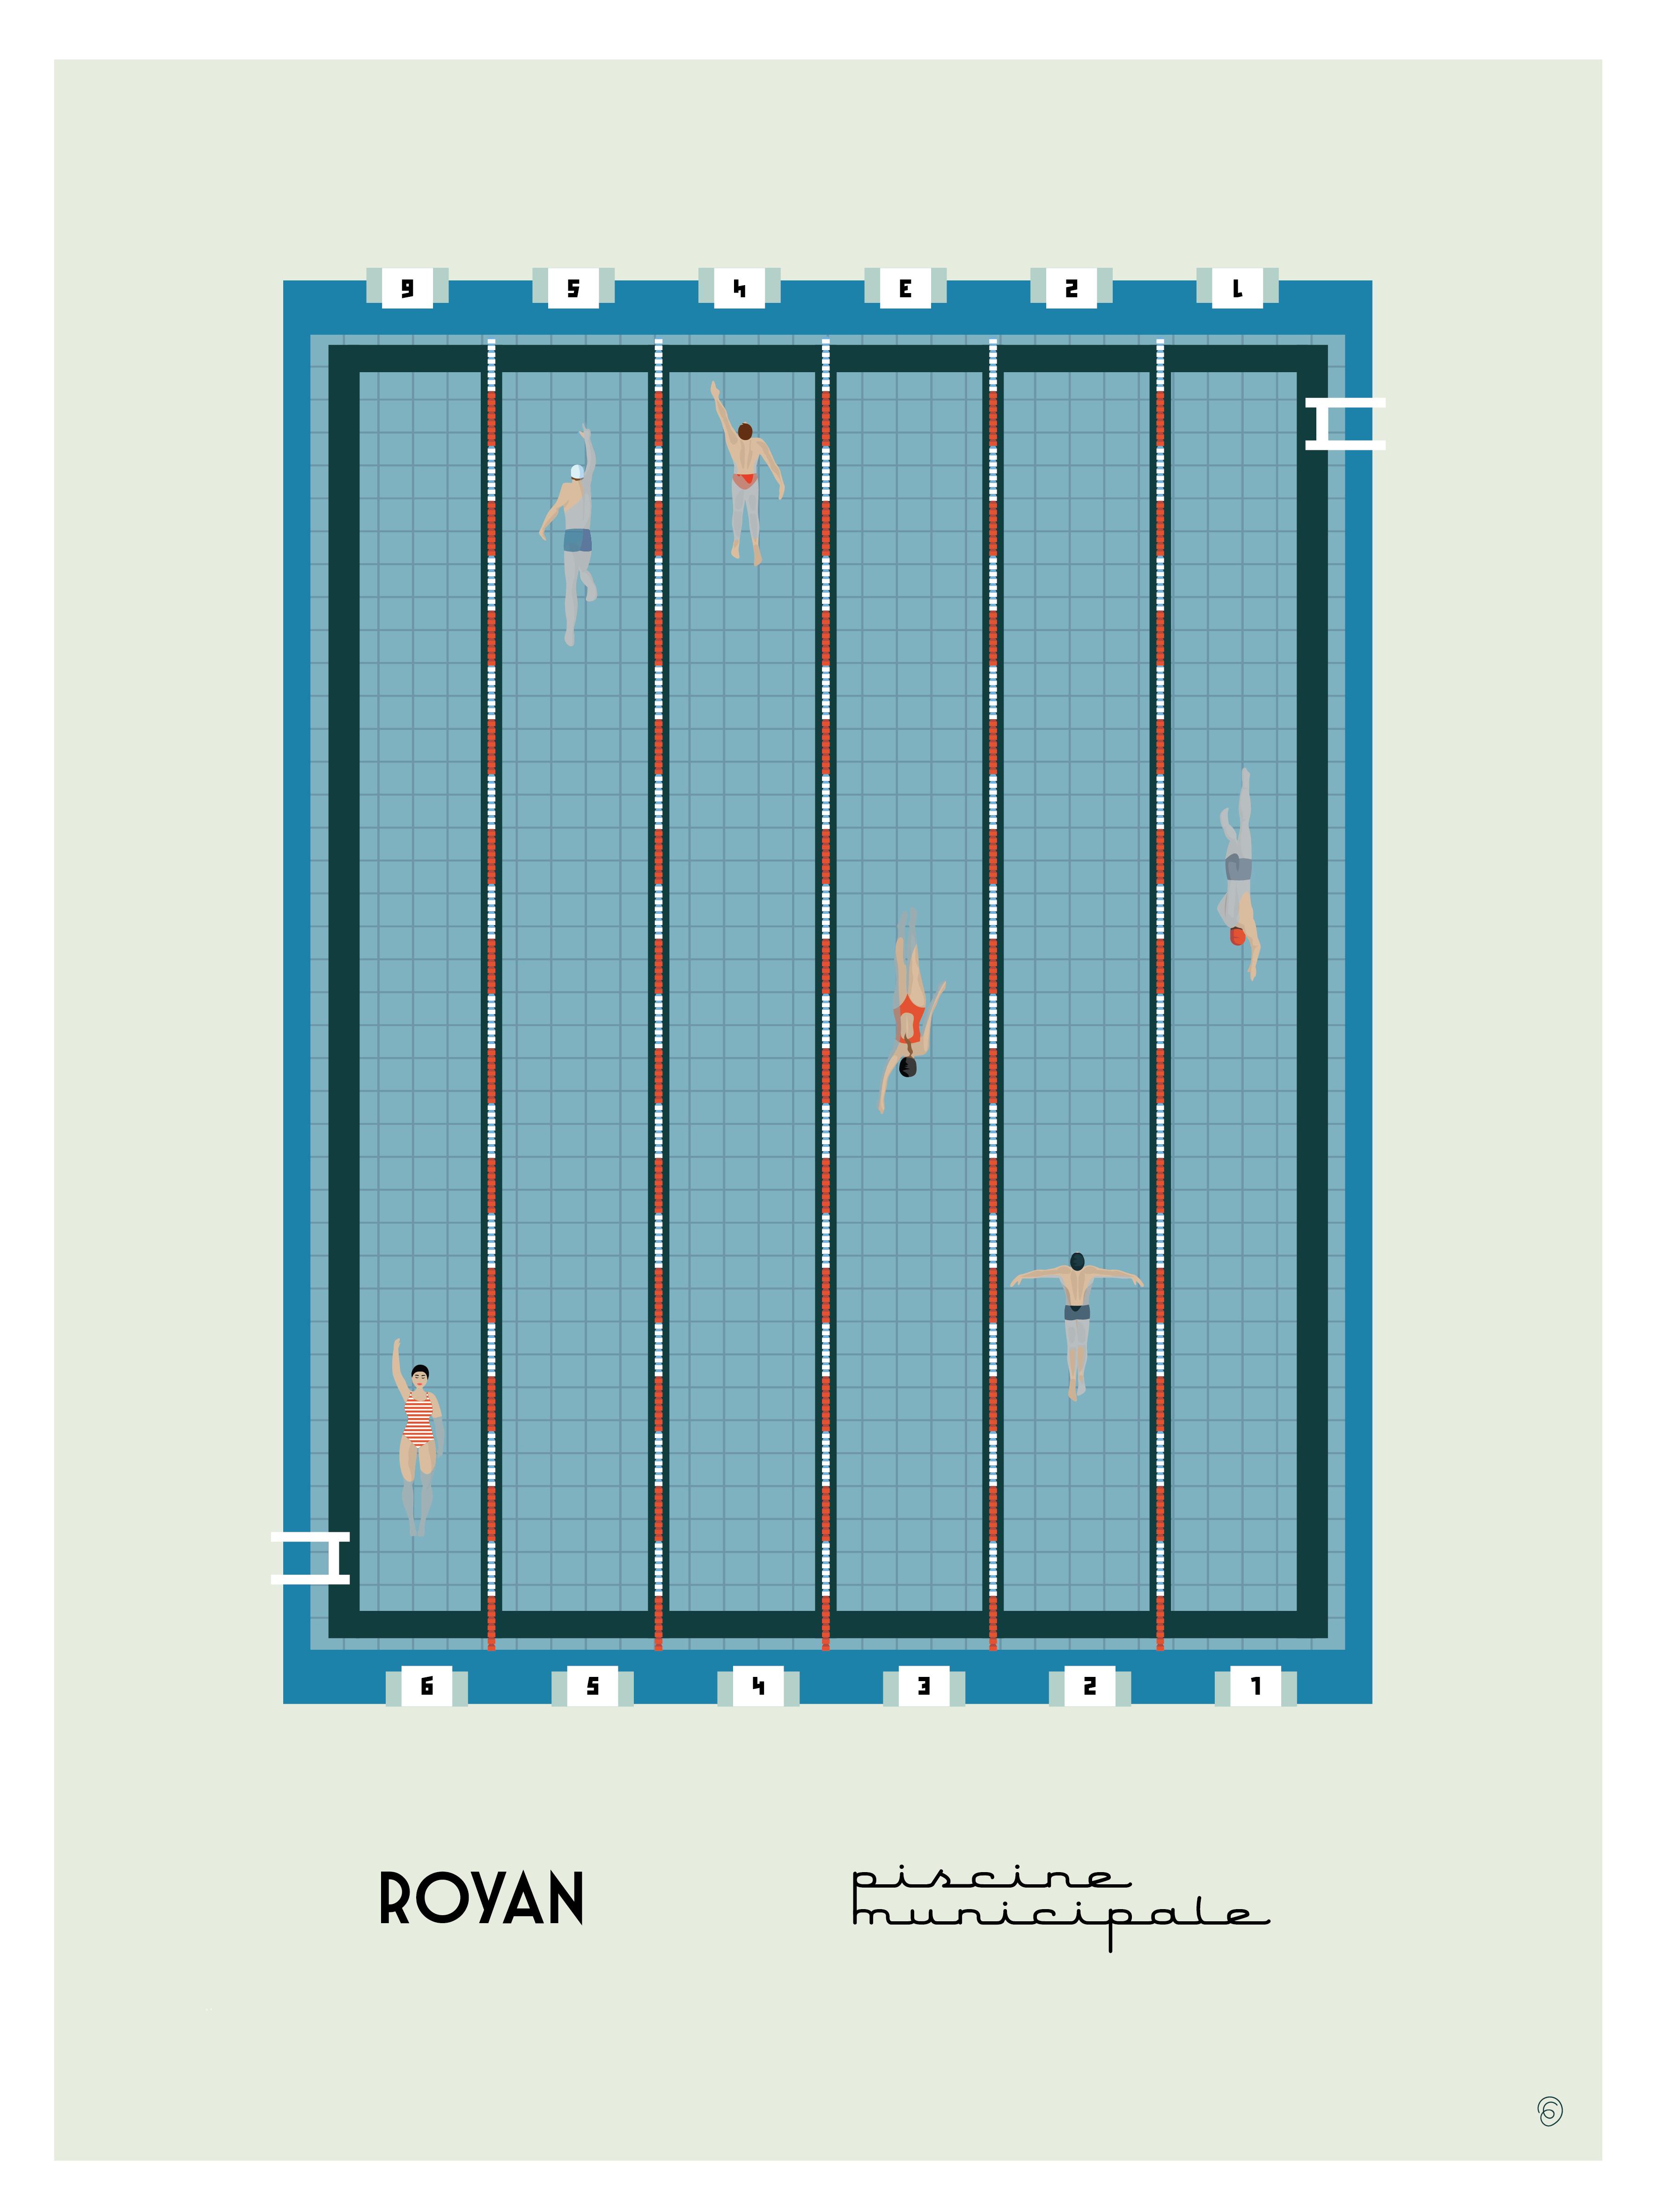 Royan Piscine Municipale #2